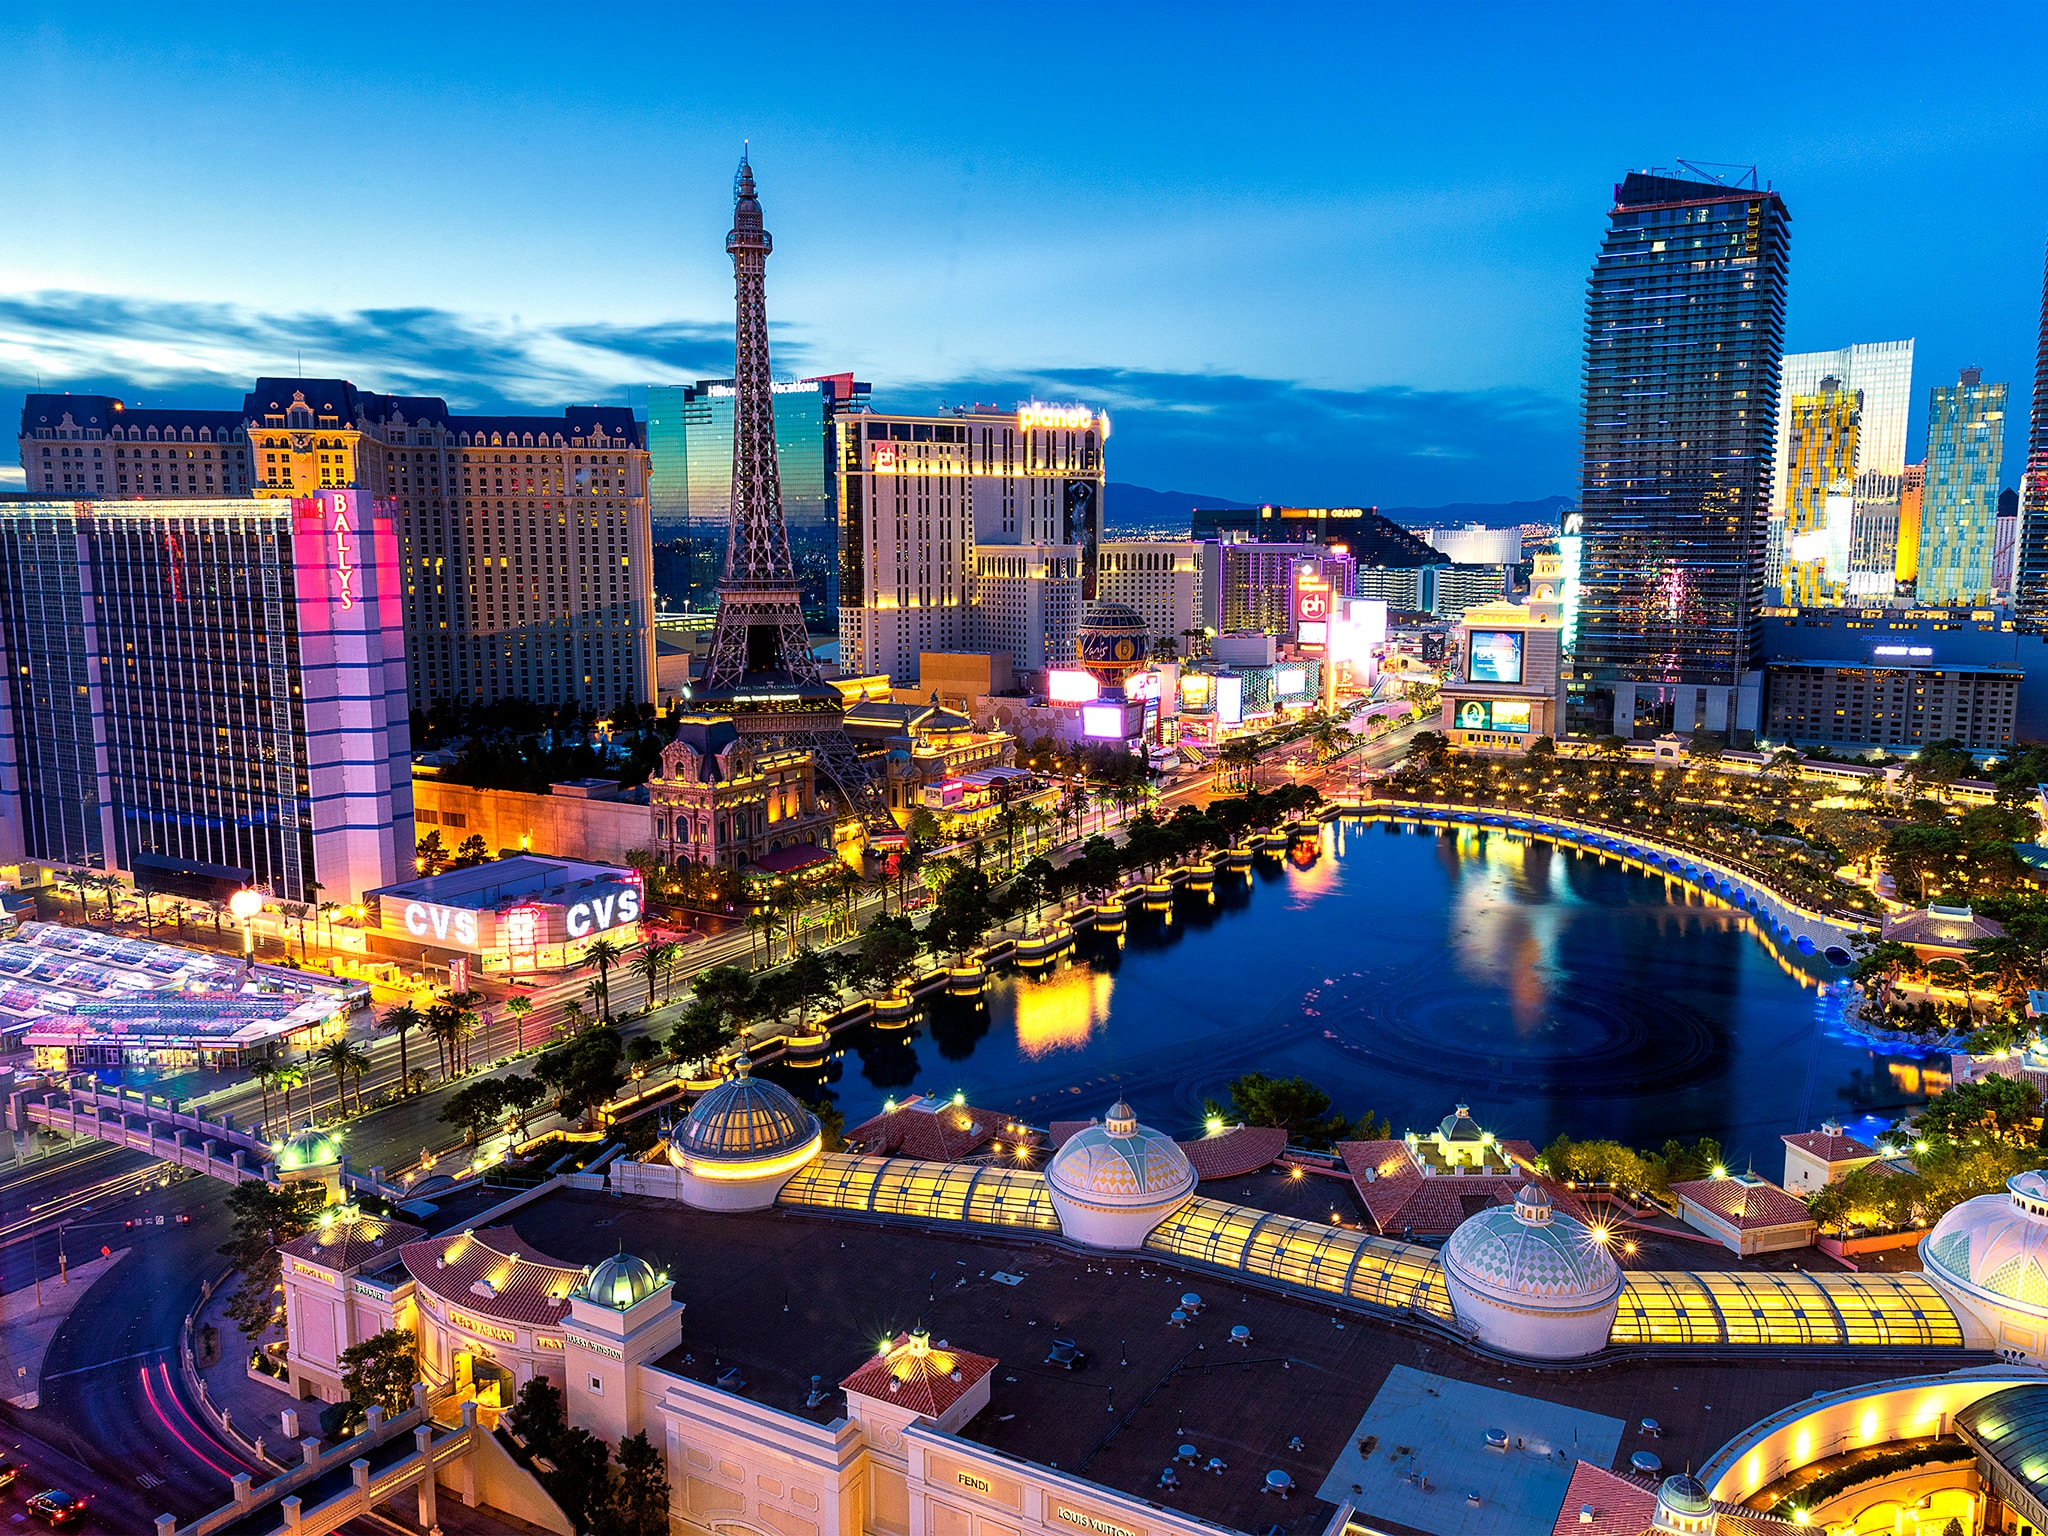 city view of Las Vegas